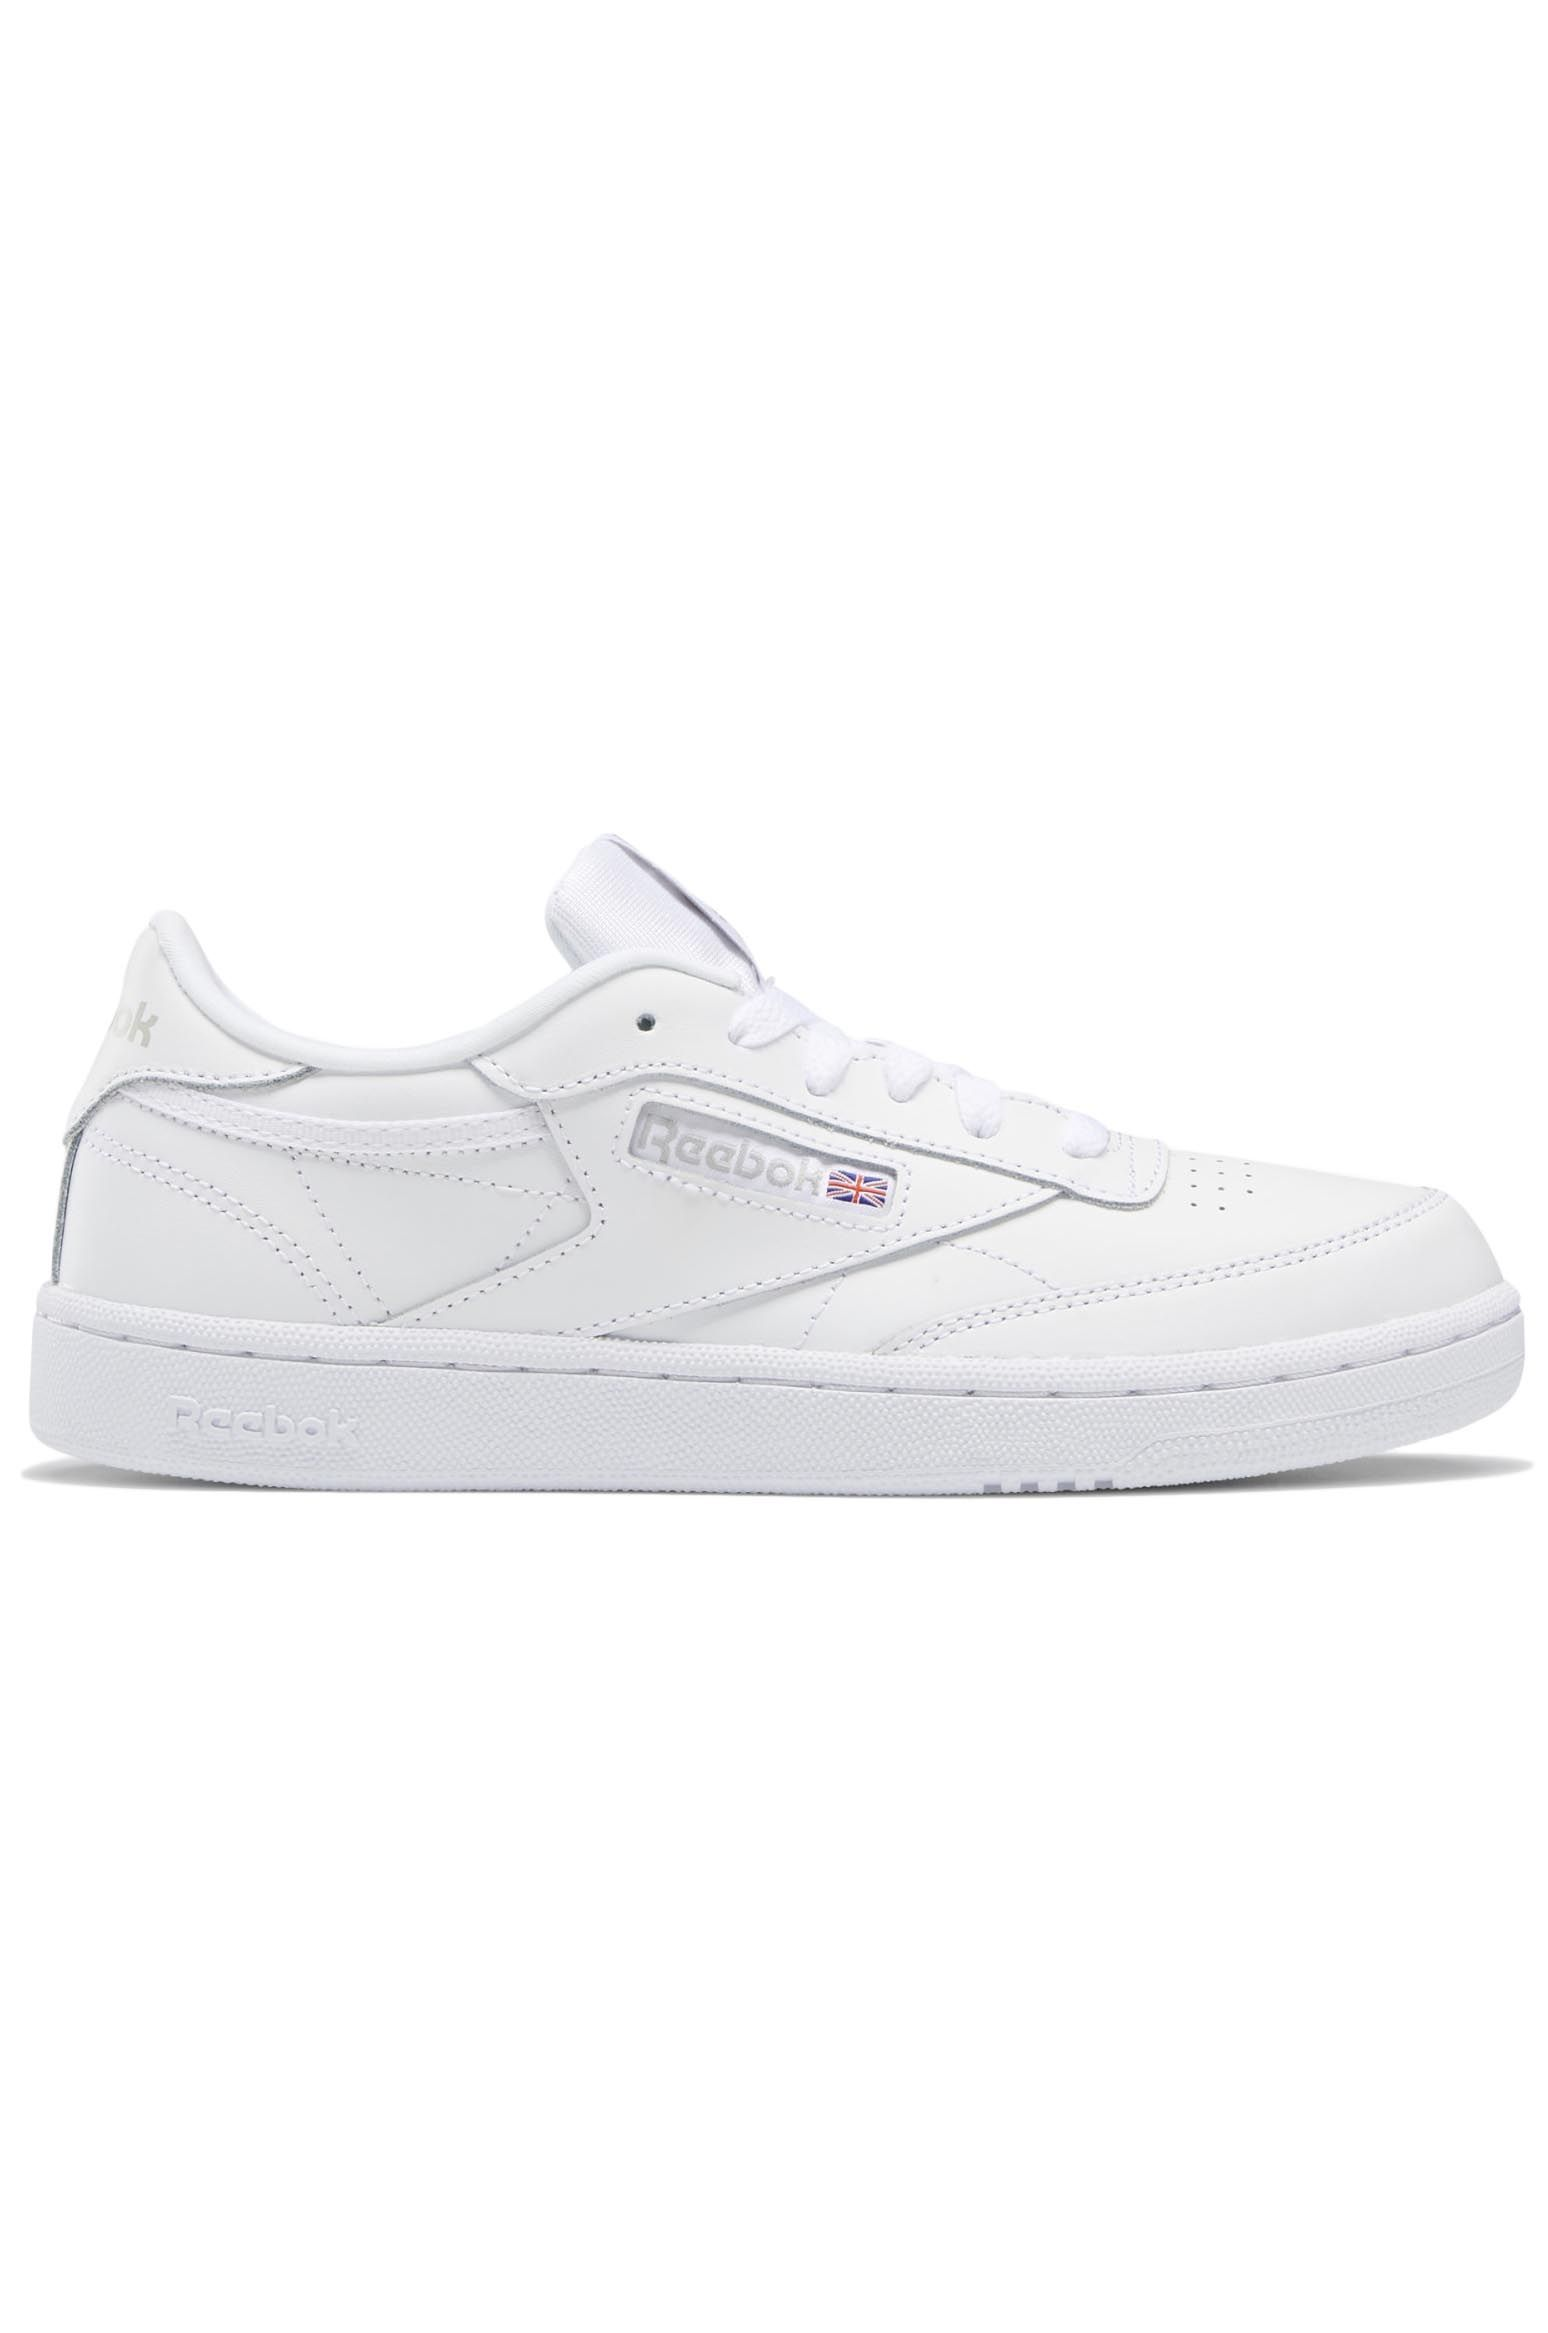 Tenis Reebok CLUB C White/Sheer Grey